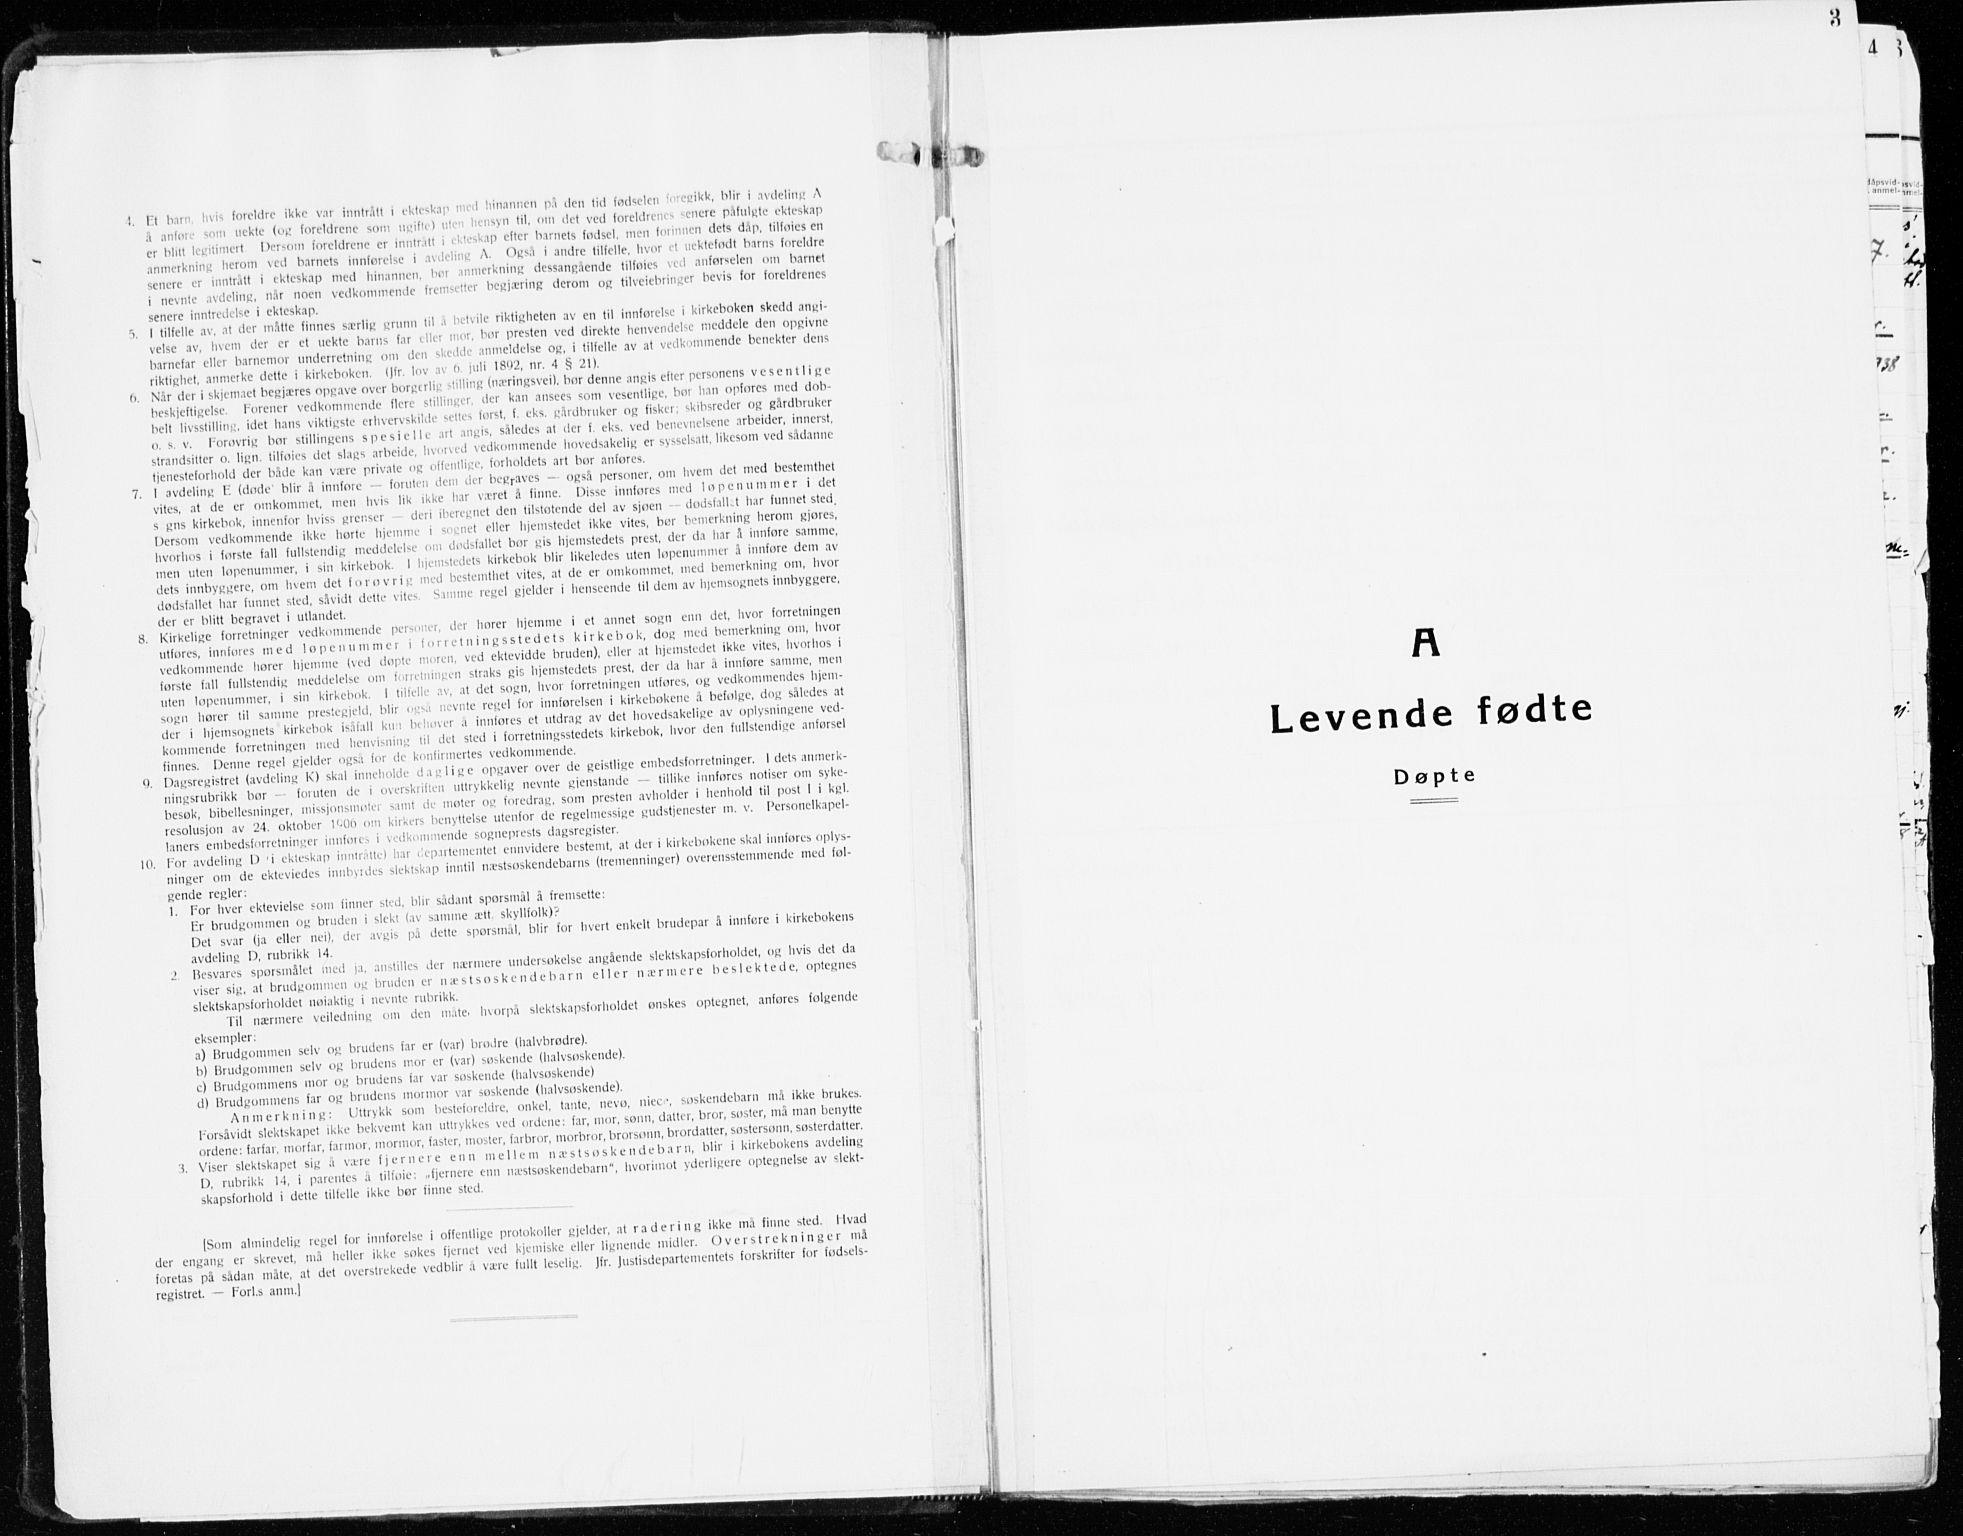 SAH, Stange prestekontor, K/L0027: Ministerialbok nr. 27, 1937-1947, s. 3